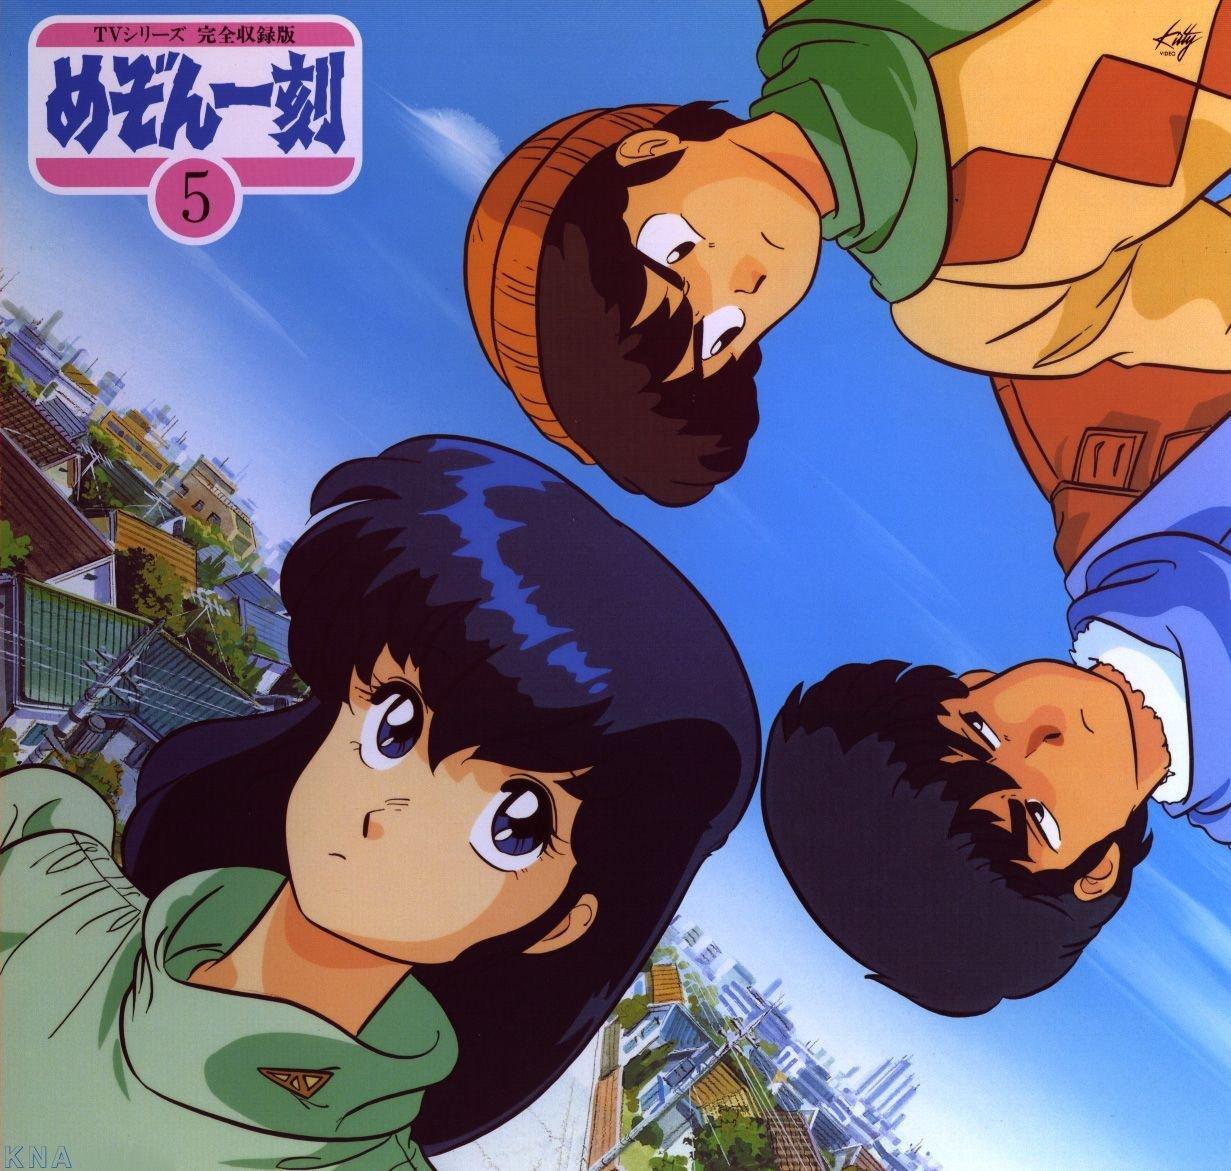 Maison Ikkoku 10: 10 Animes De Los 80's Que Merecen Un Remake